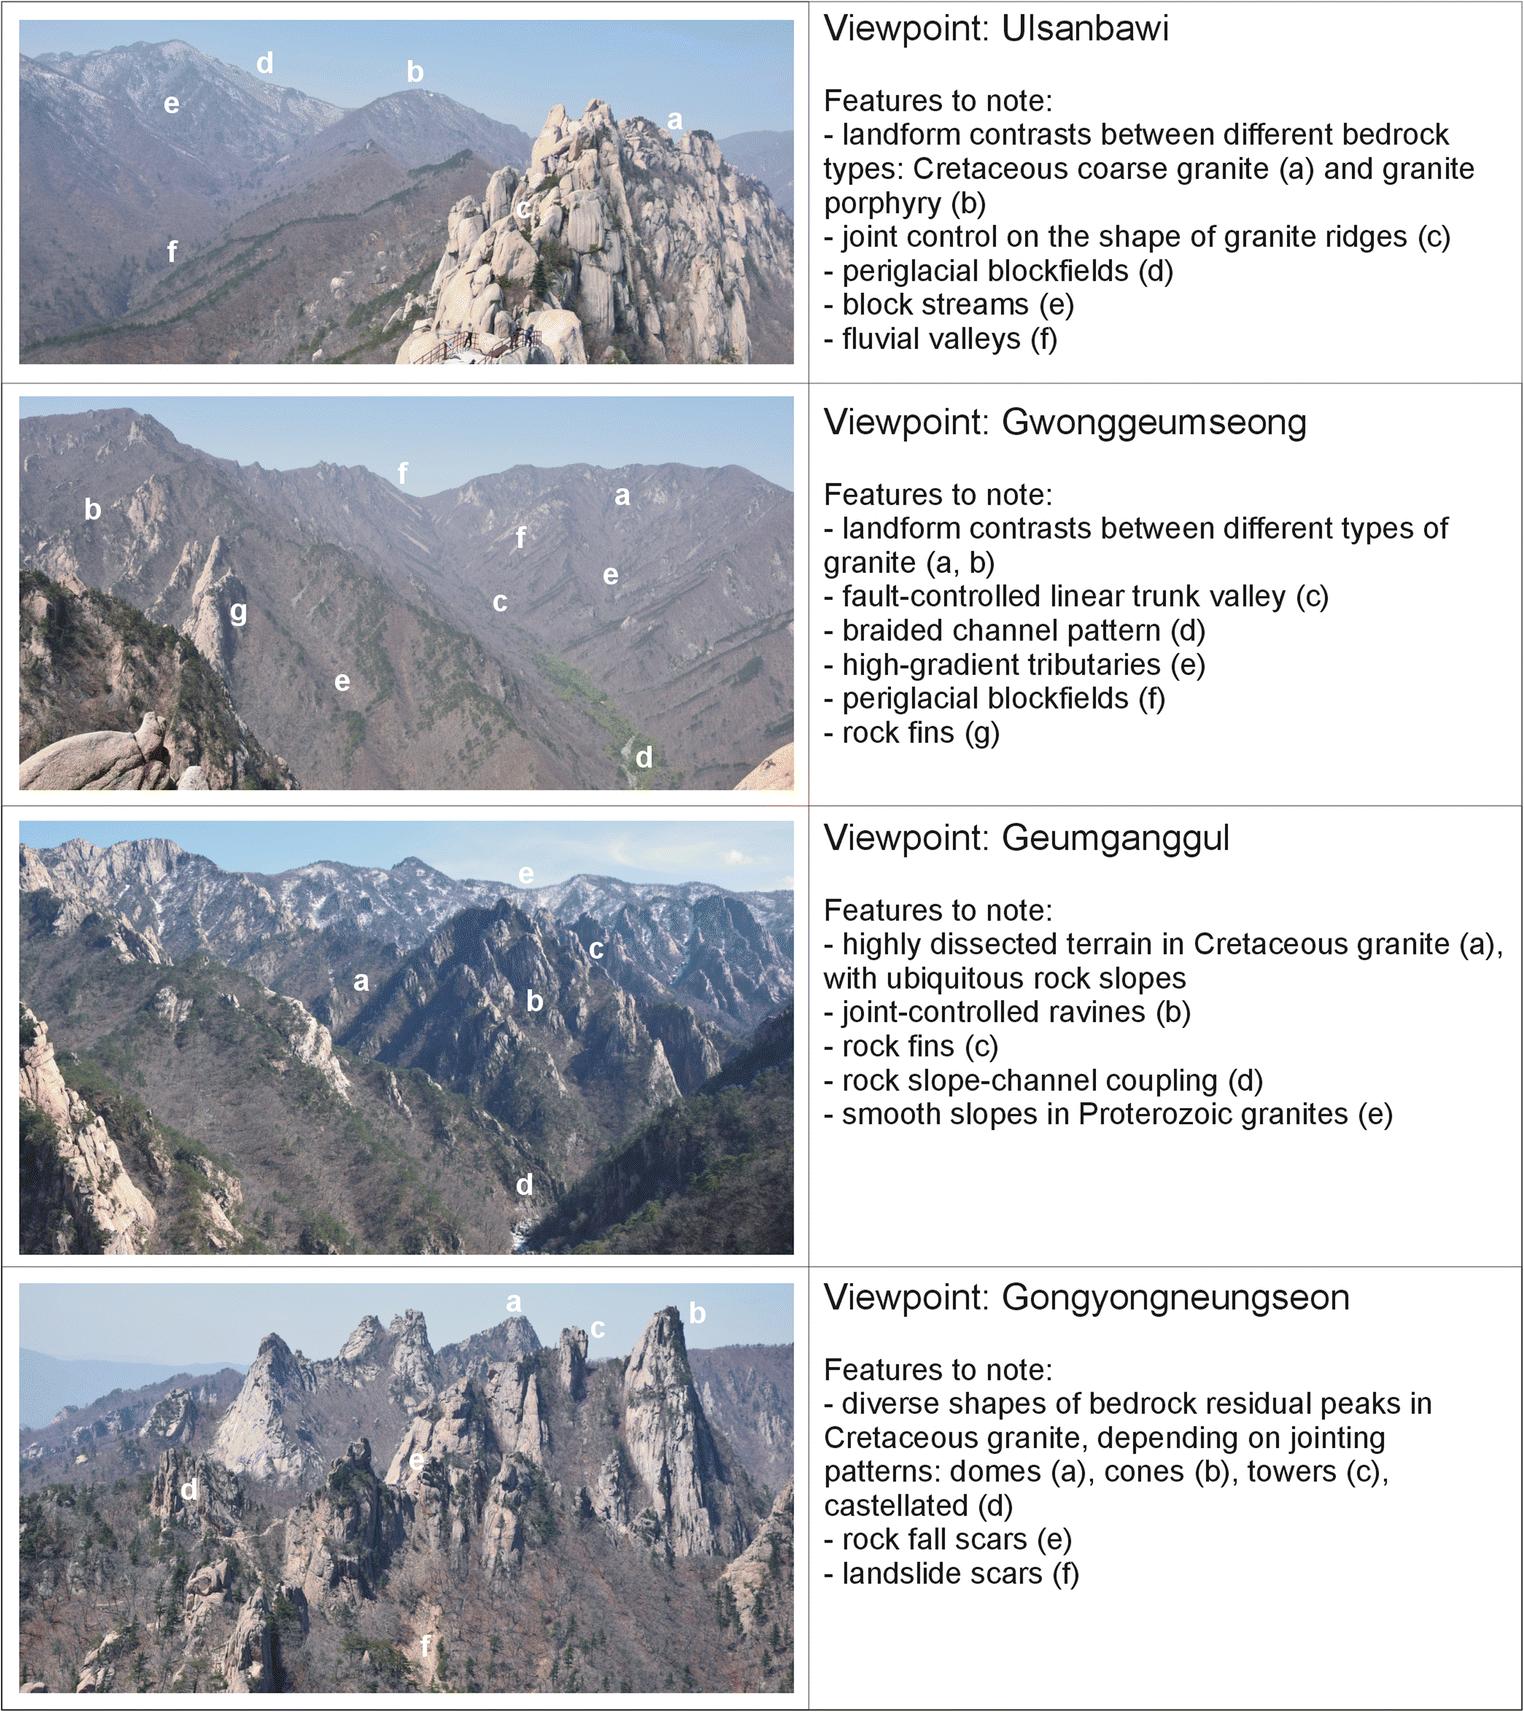 Granite Landform Diversity and Dynamics Underpin Geoheritage